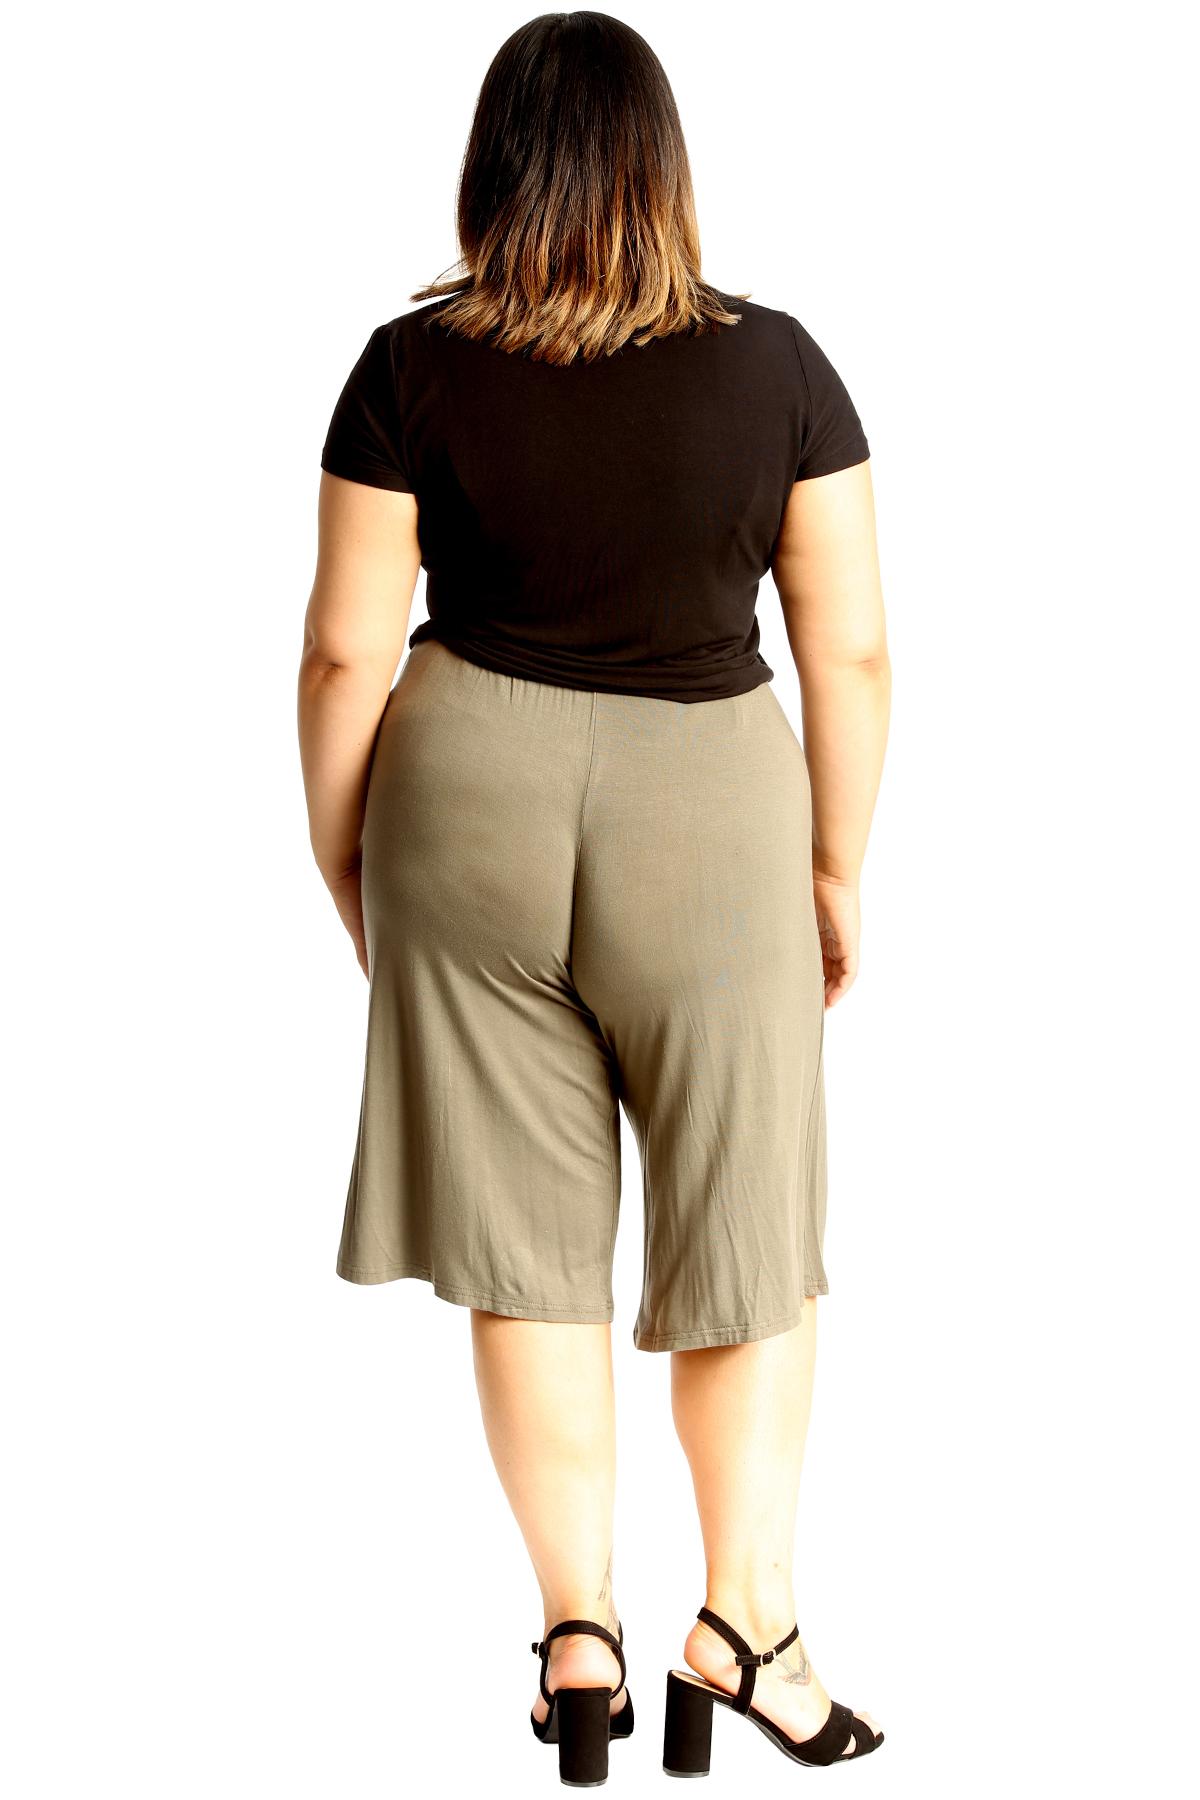 New-Womens-Plus-Size-Culottes-Ladies-Plain-Shorts-Palazzo-Elastic-Pants-Summer thumbnail 56